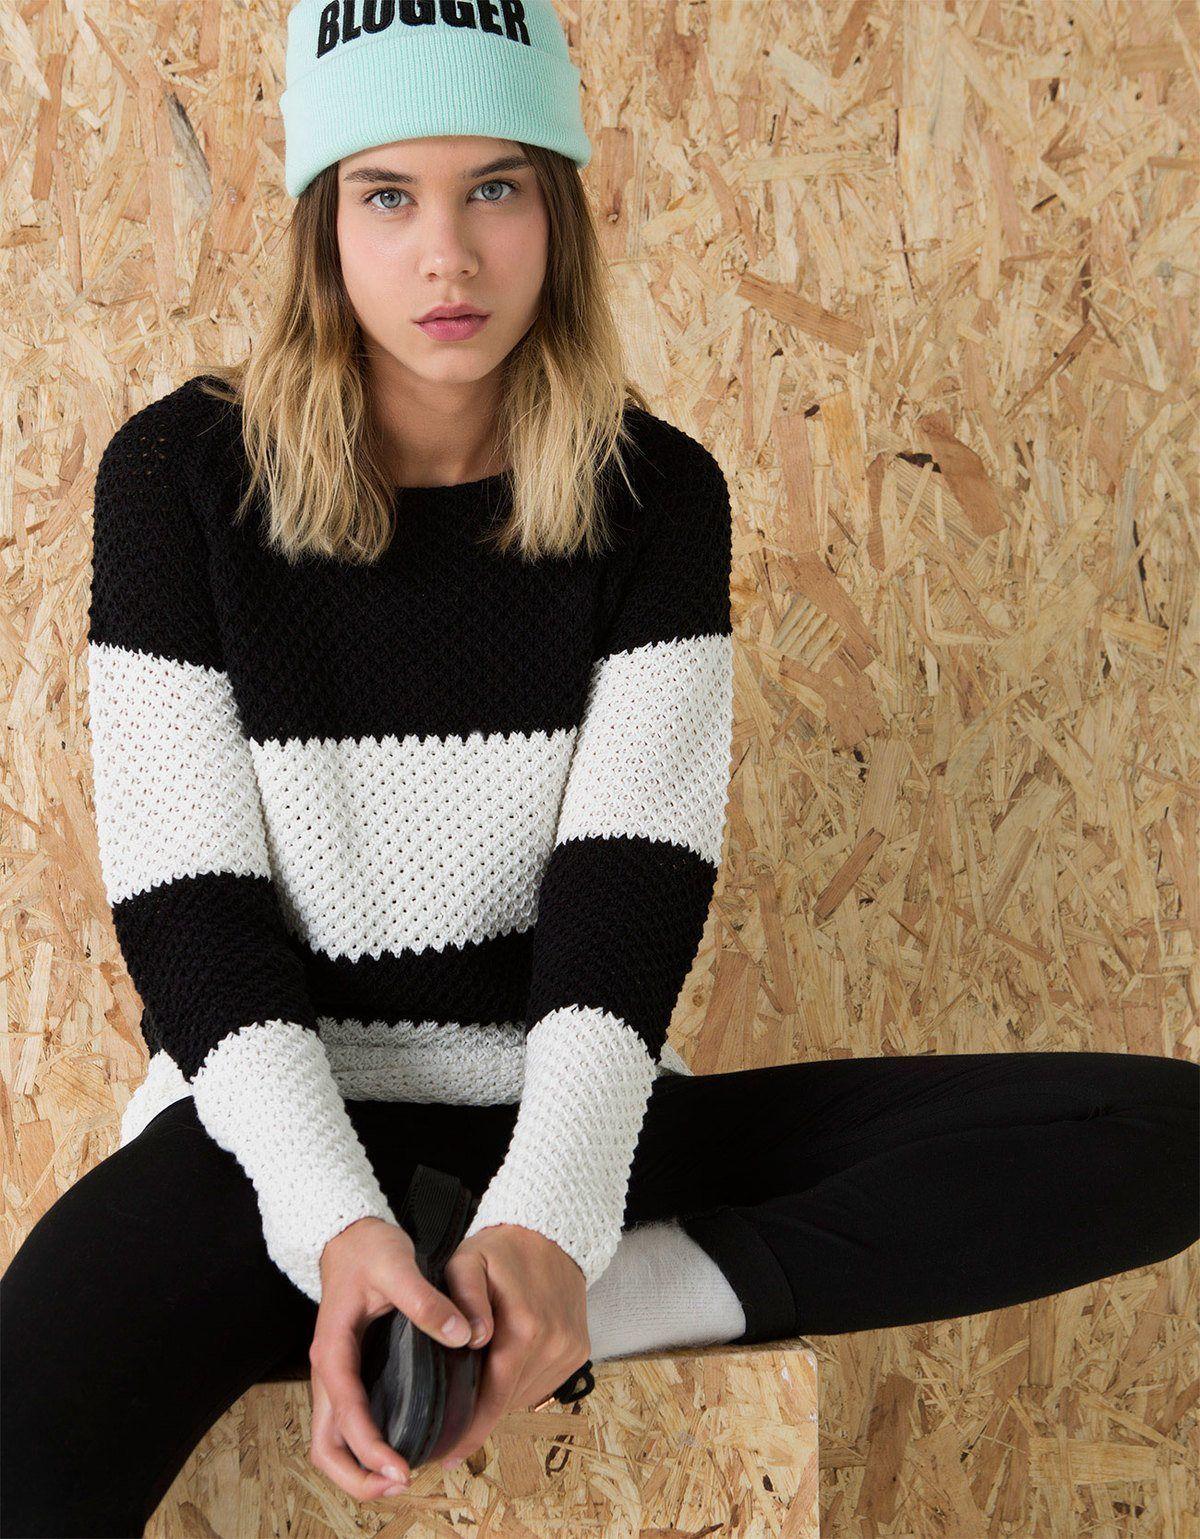 Catálogo Bershka para mujer Otoño-Invierno  Moda  Fashion  80fc6c76442